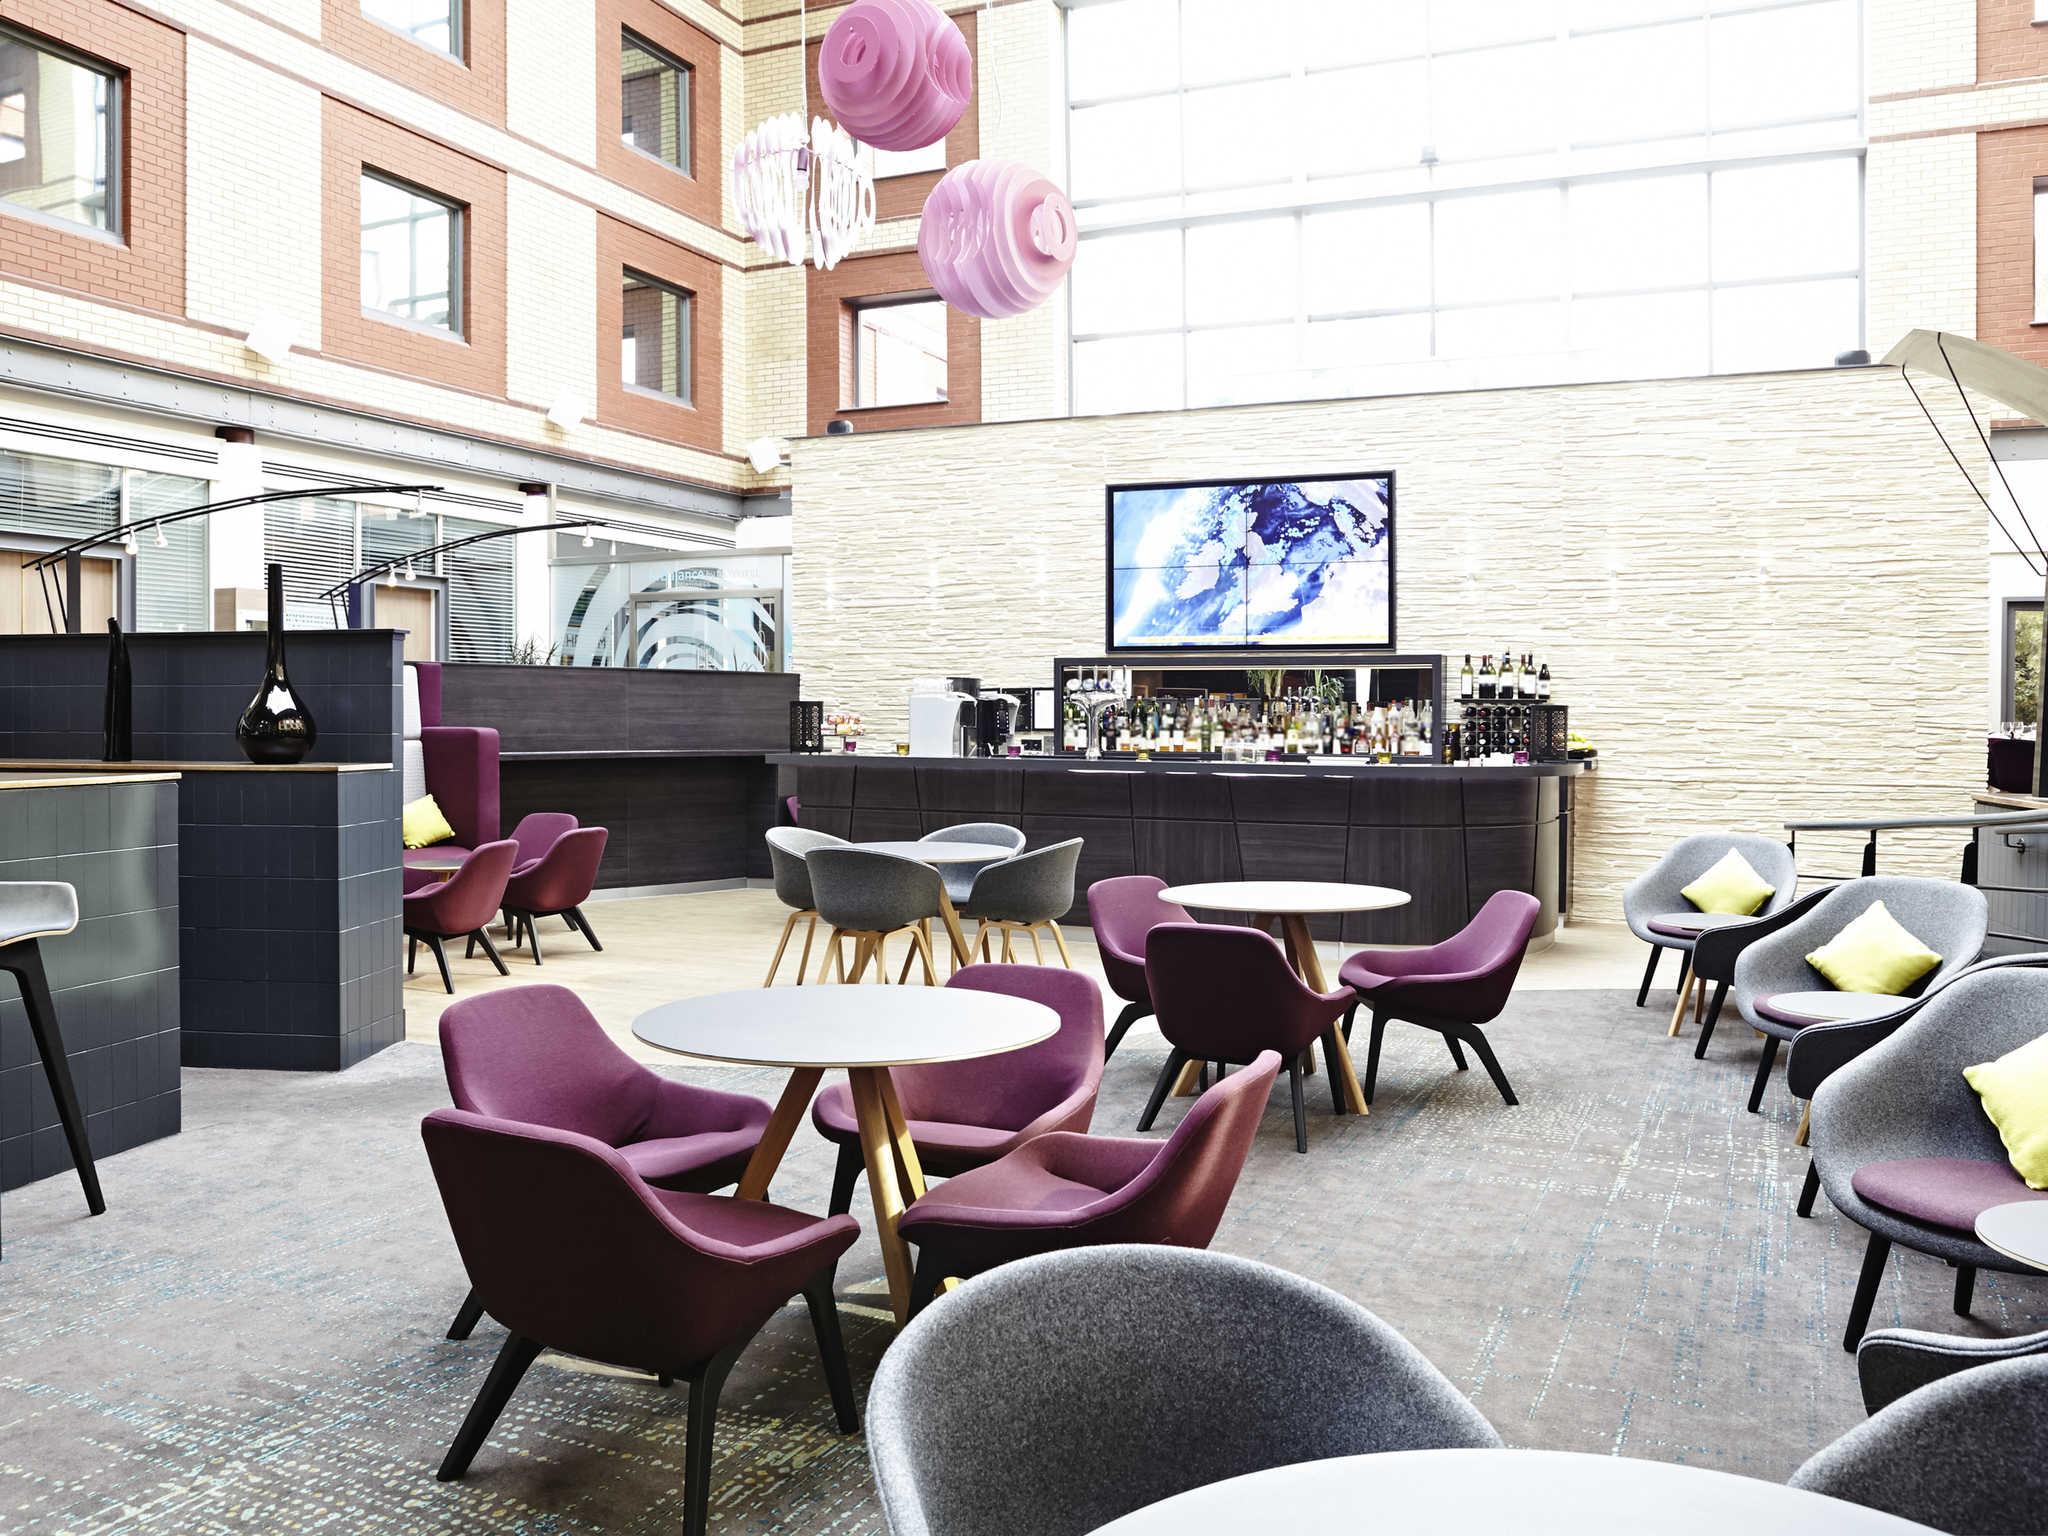 Hotel - Novotel London Heathrow Airport - M4 Jct 4